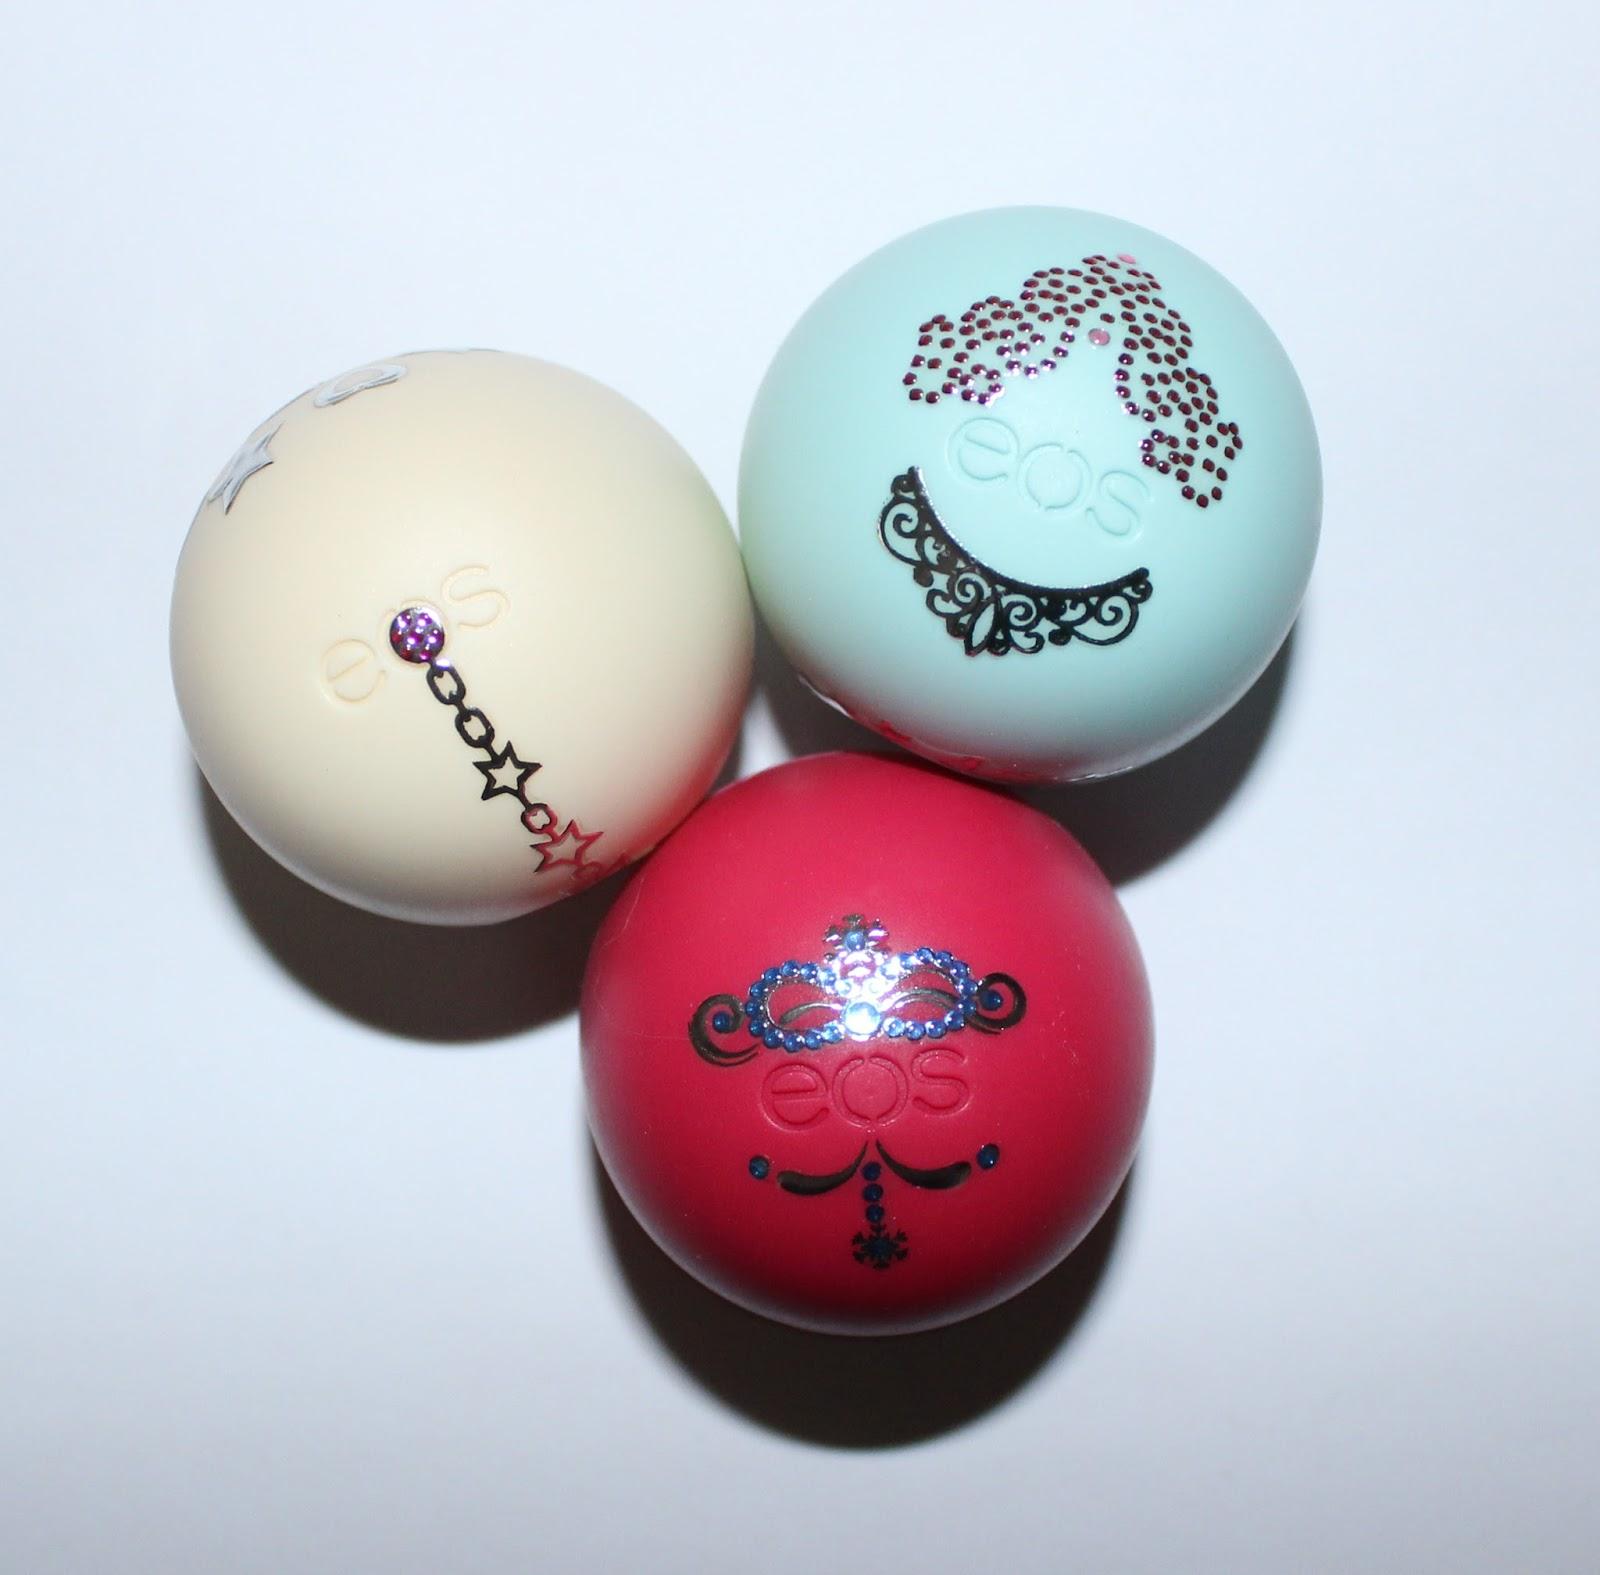 Beyond Blush: eos Holiday 2015 Decorative Lip Balm Collection